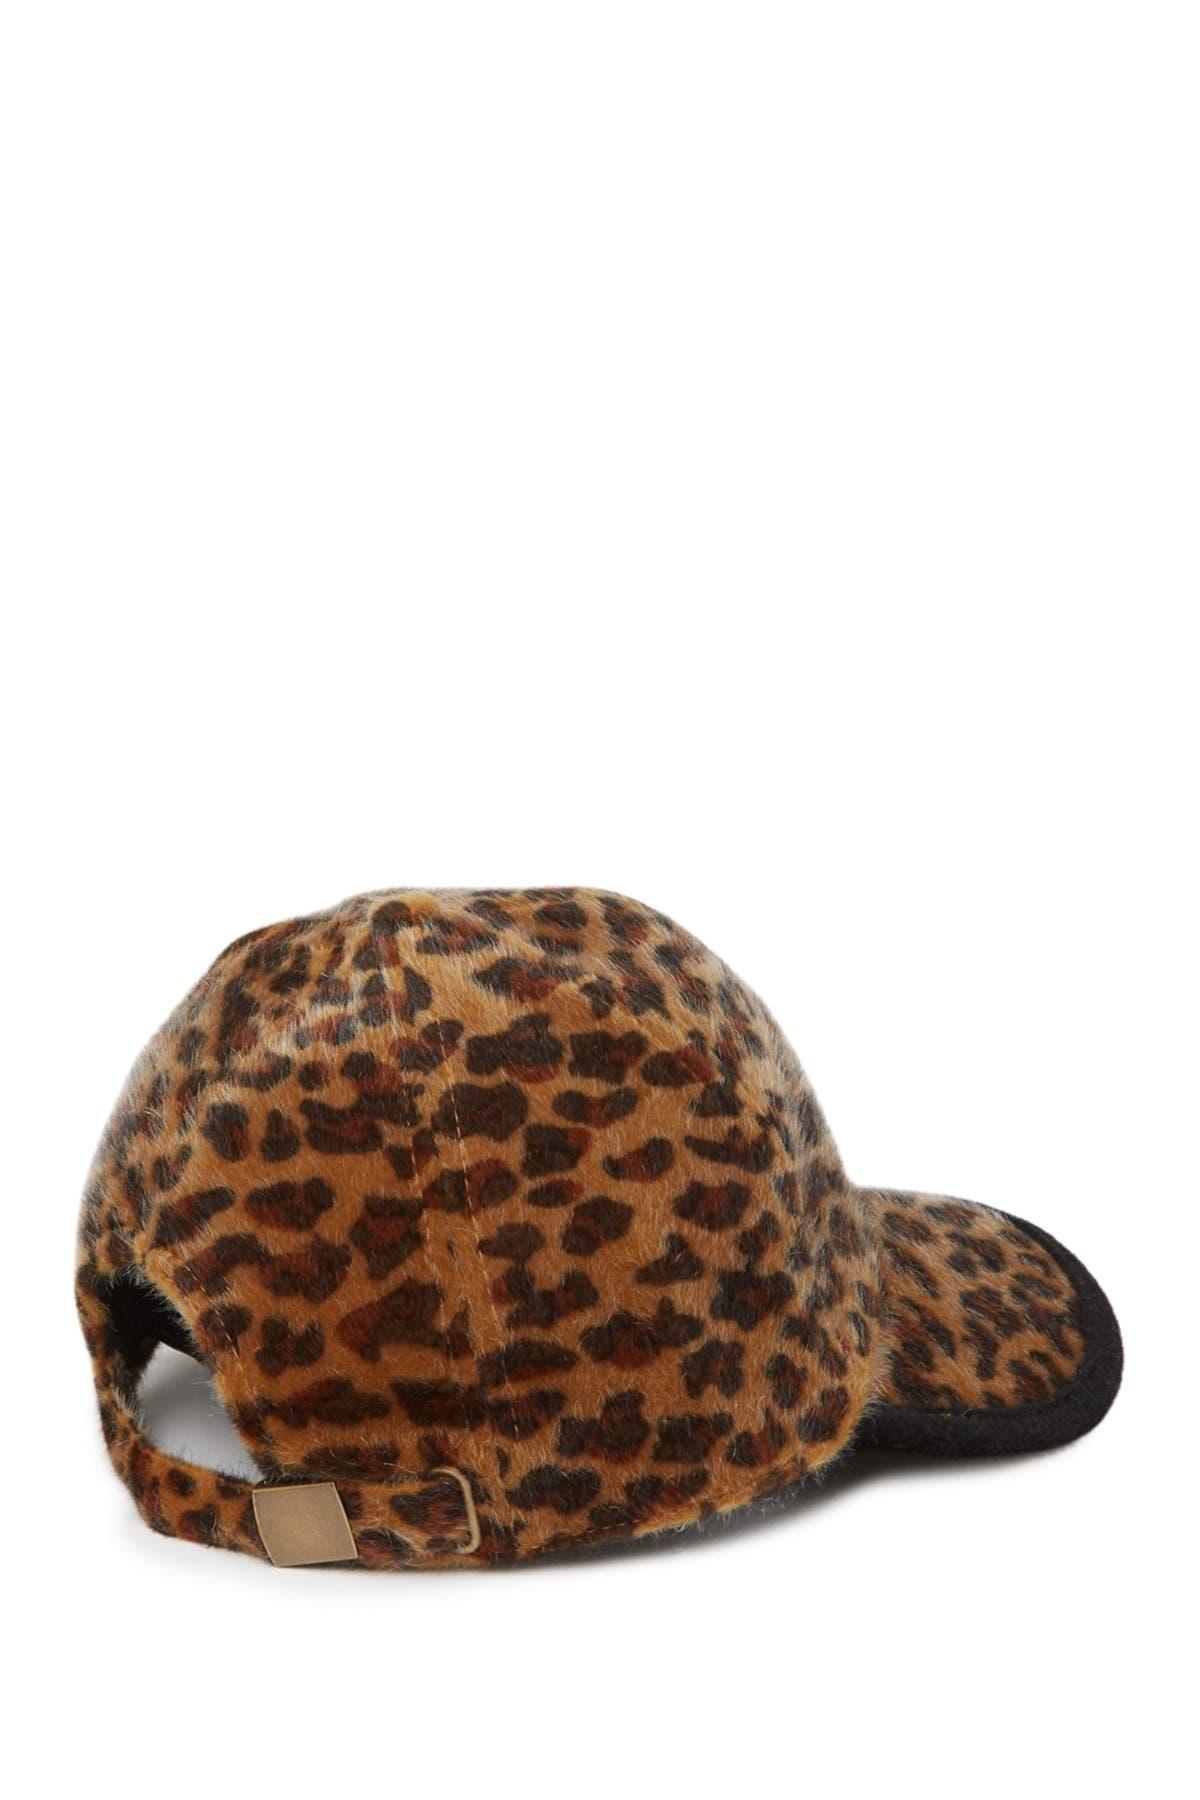 Image of August Hat Faux Calf Hair Baseball Cap